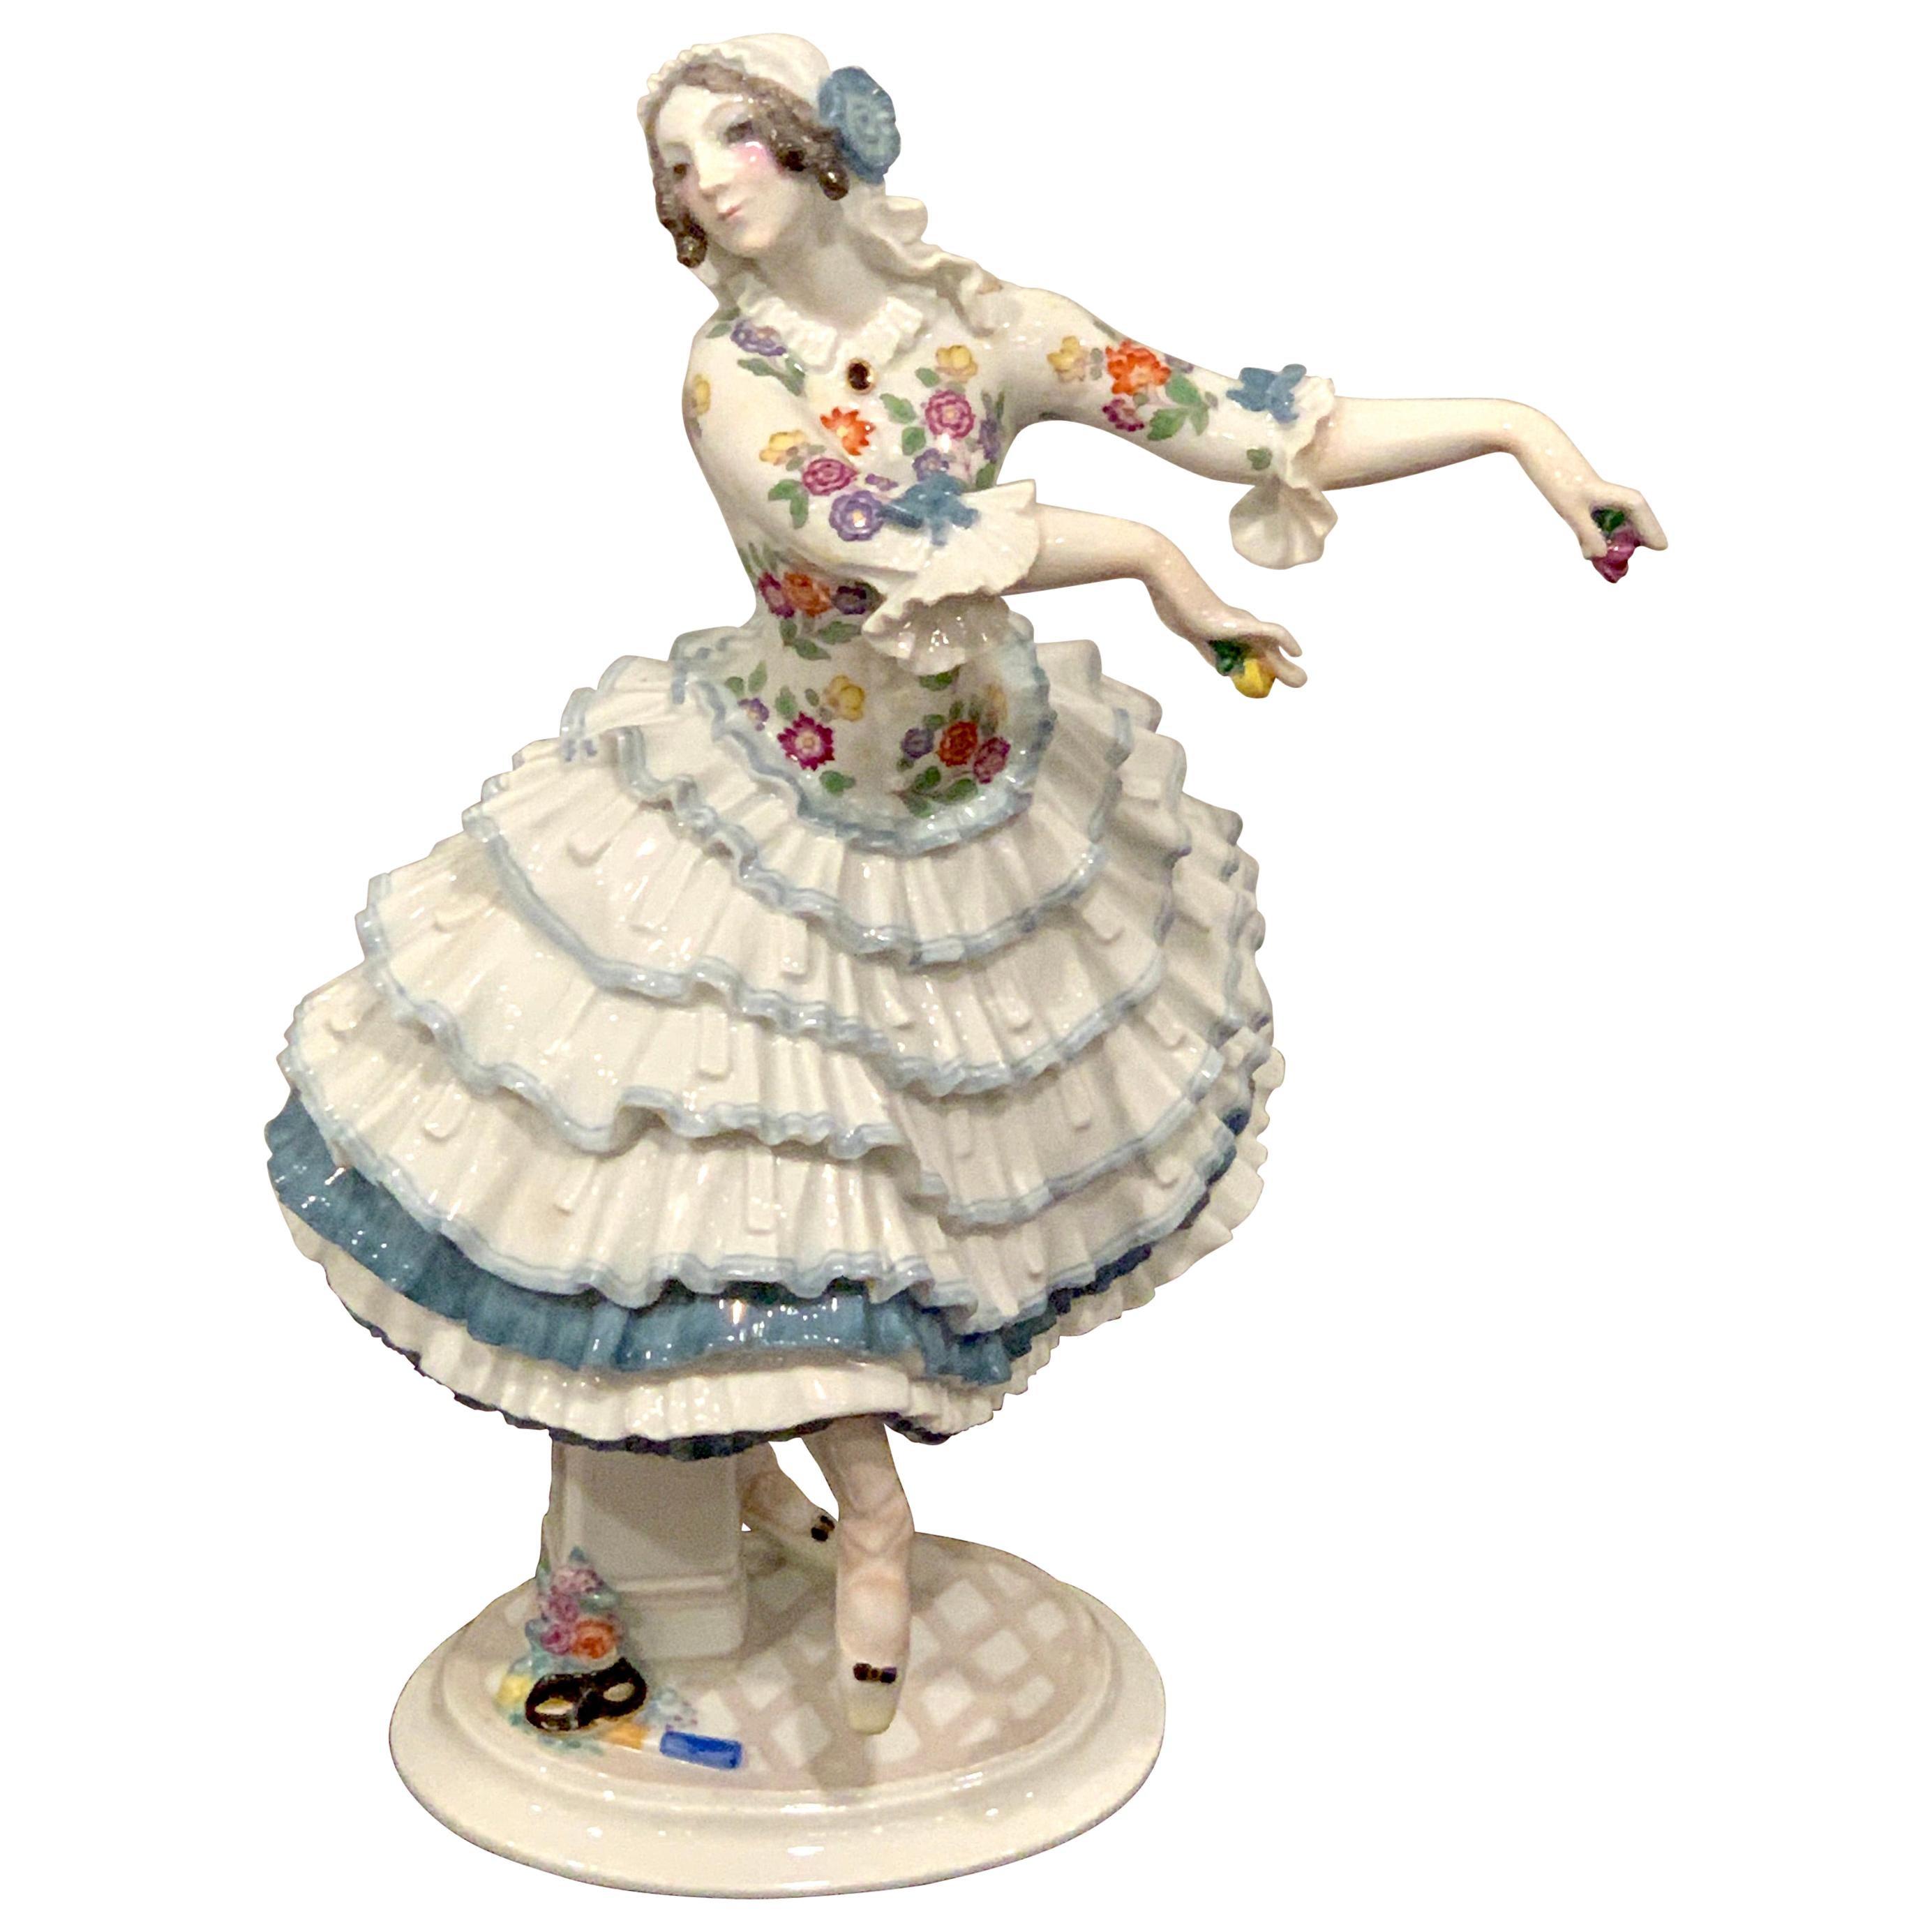 Meissen Russian Ballerina 'Chiarina', by Paul Scheurich